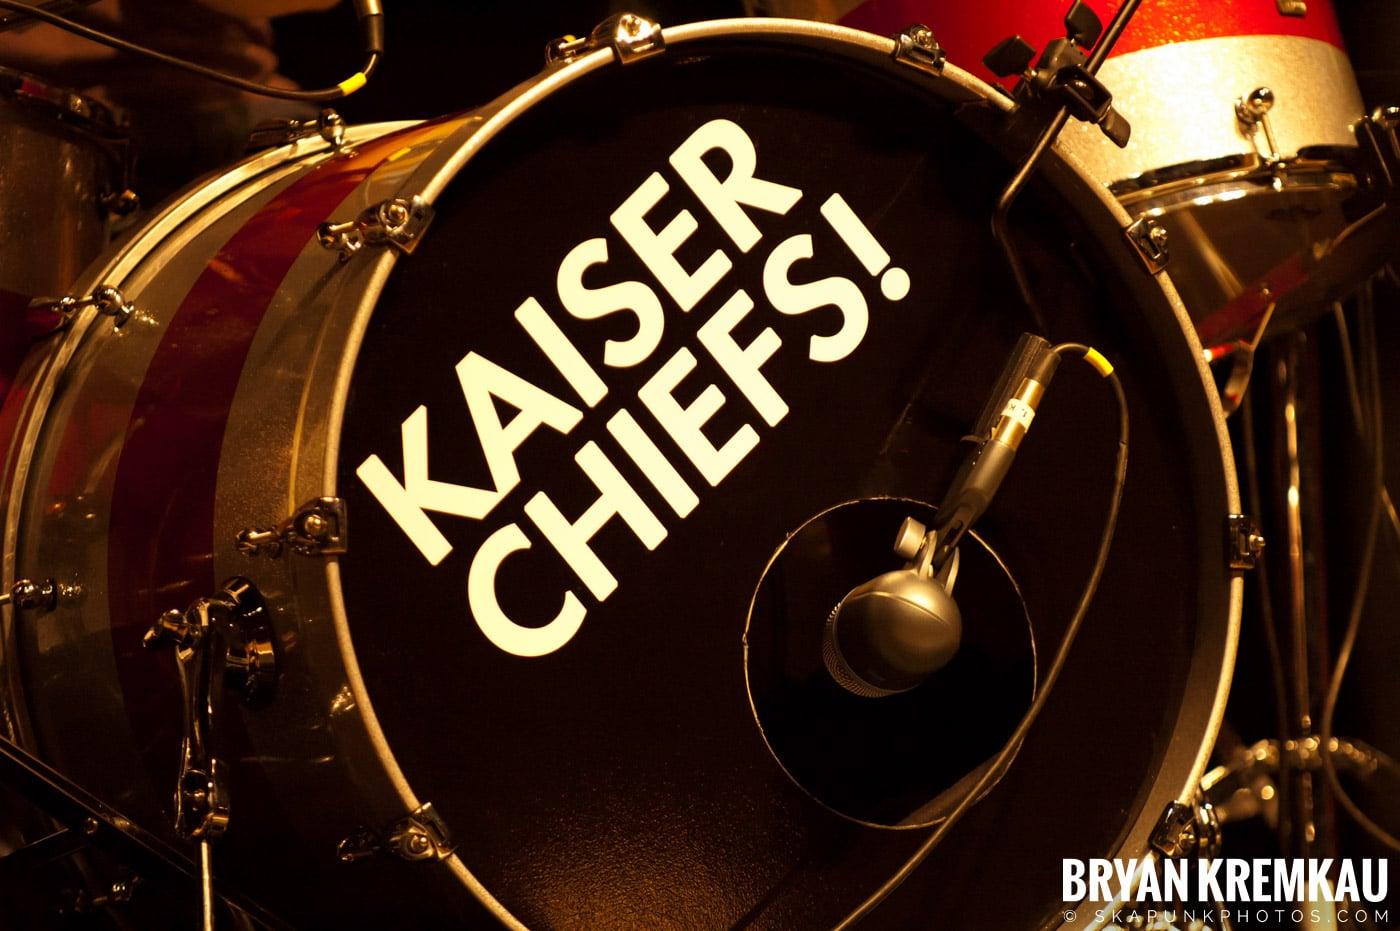 Kaiser Chiefs @ Beacon Theater, NYC - 9.30.07 (19)